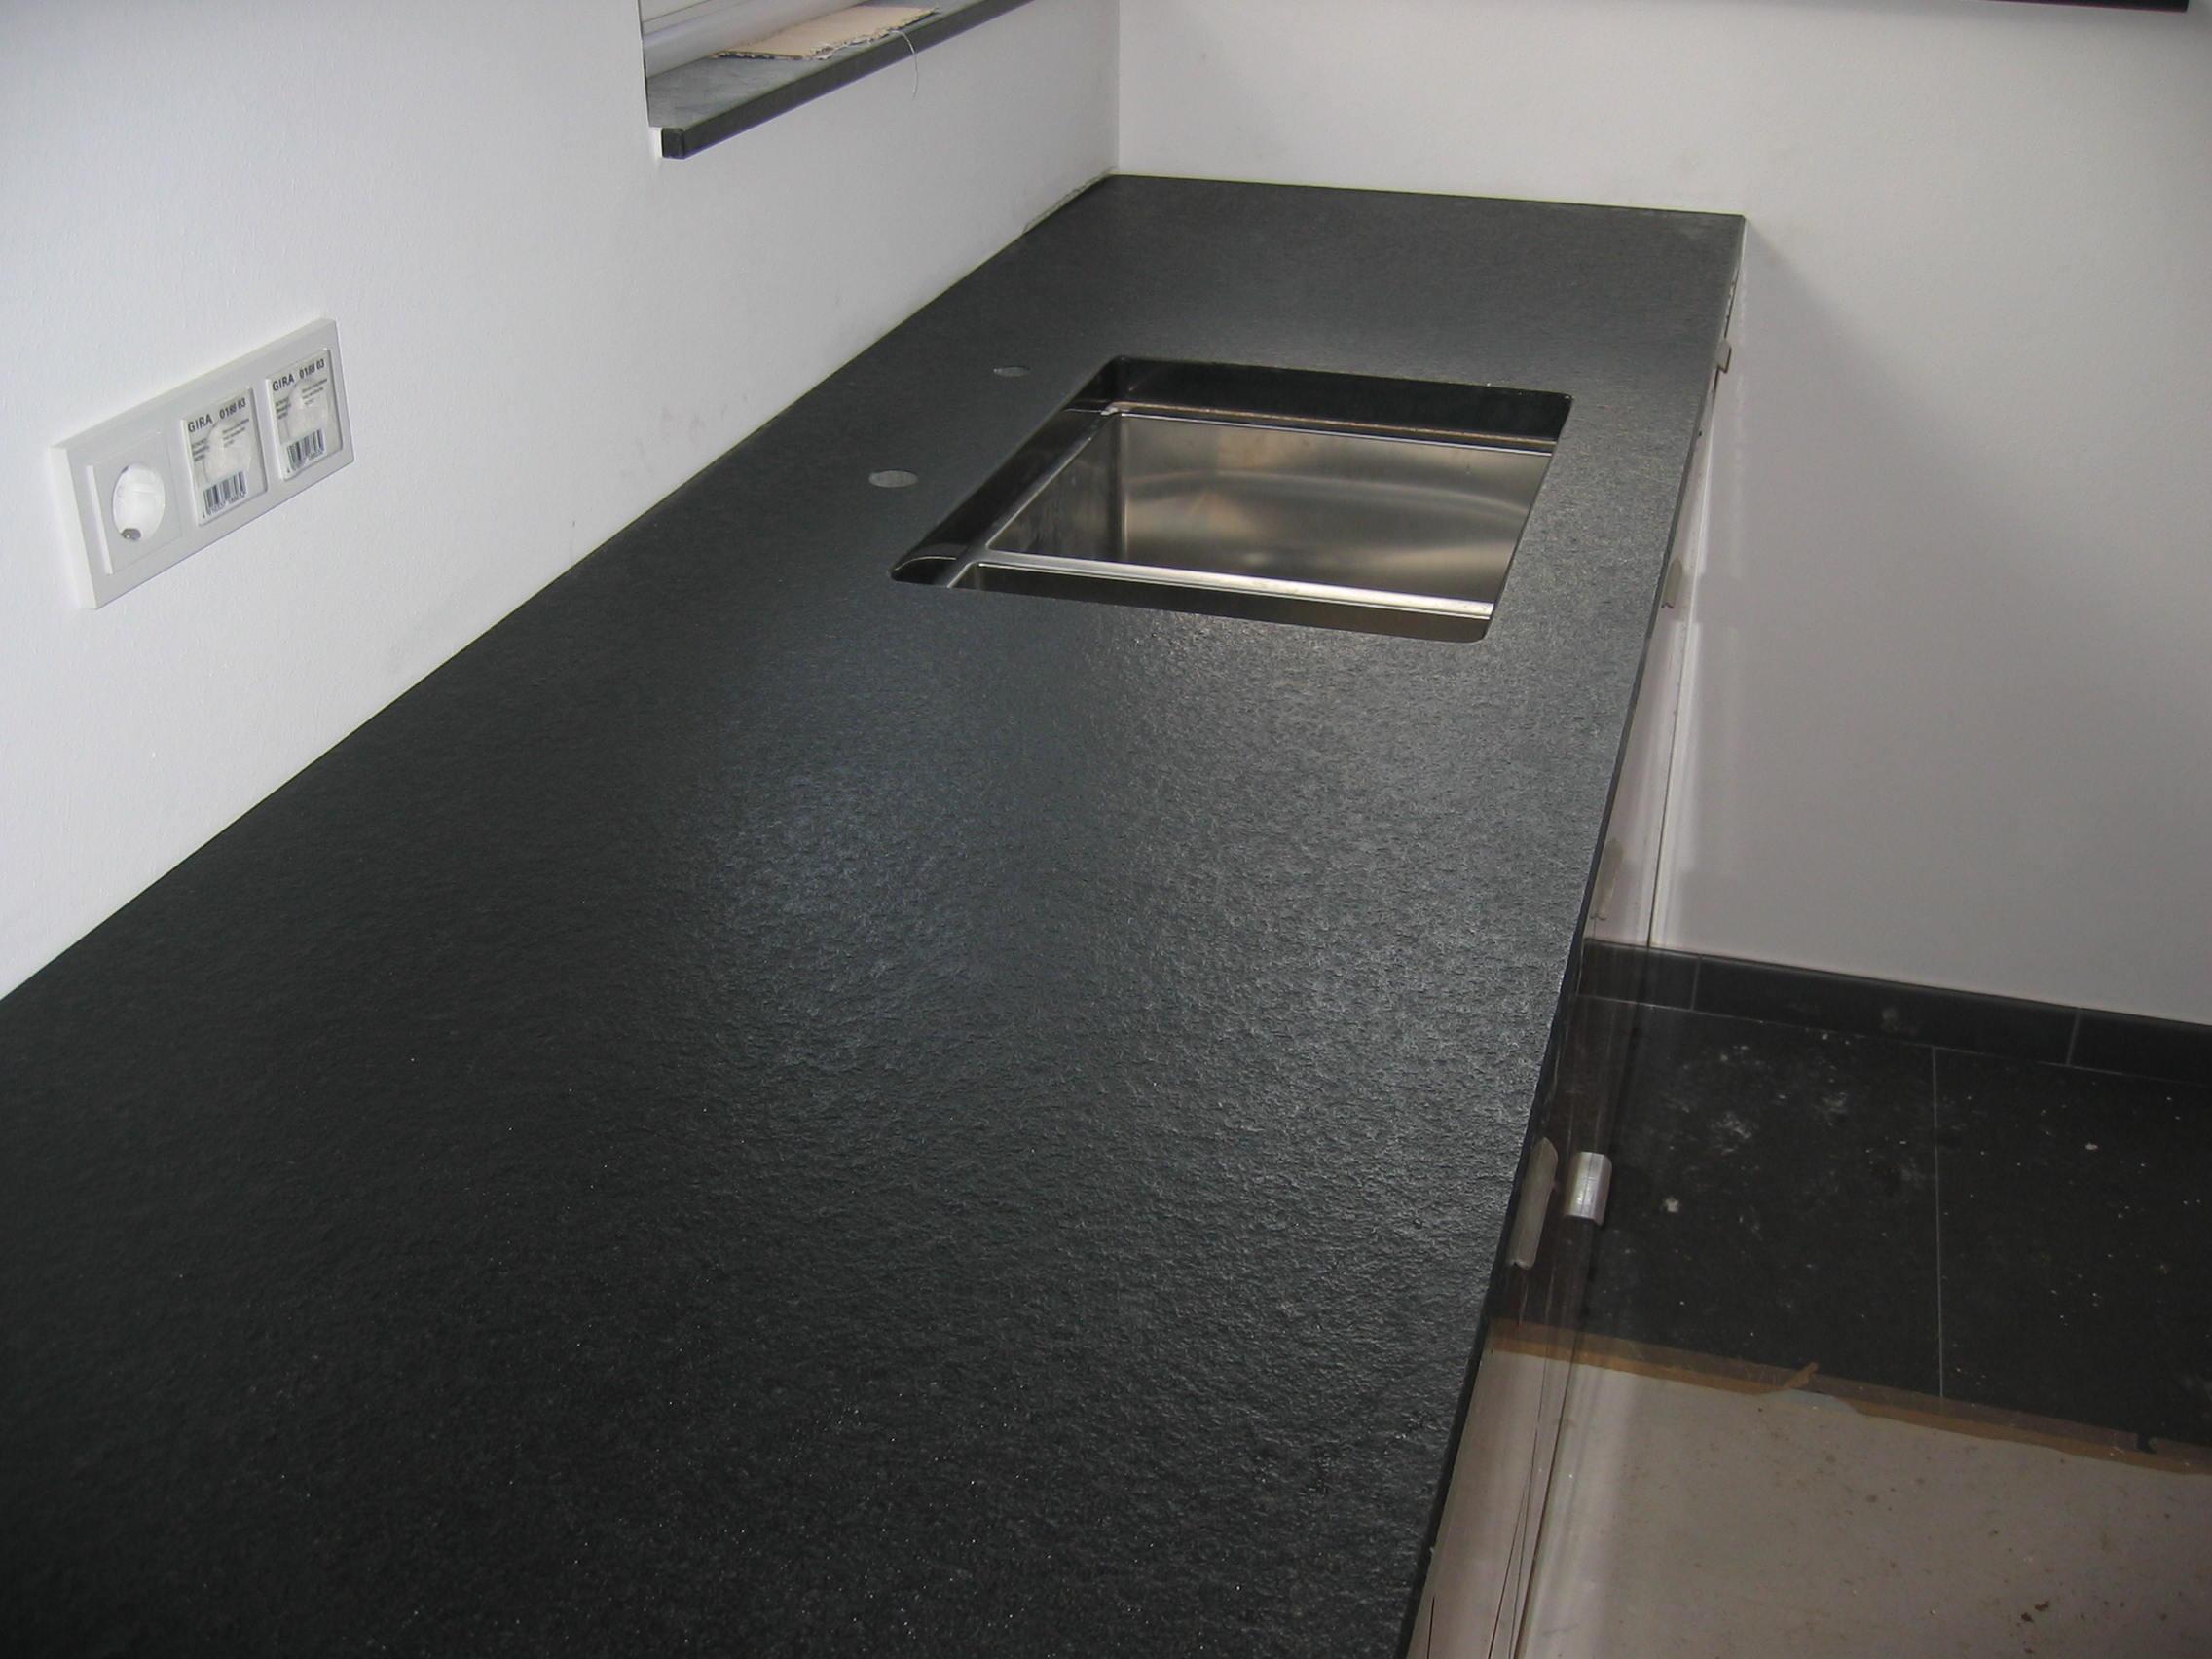 Ber uns lb stonefactory Granit schwarz arbeitsplatte